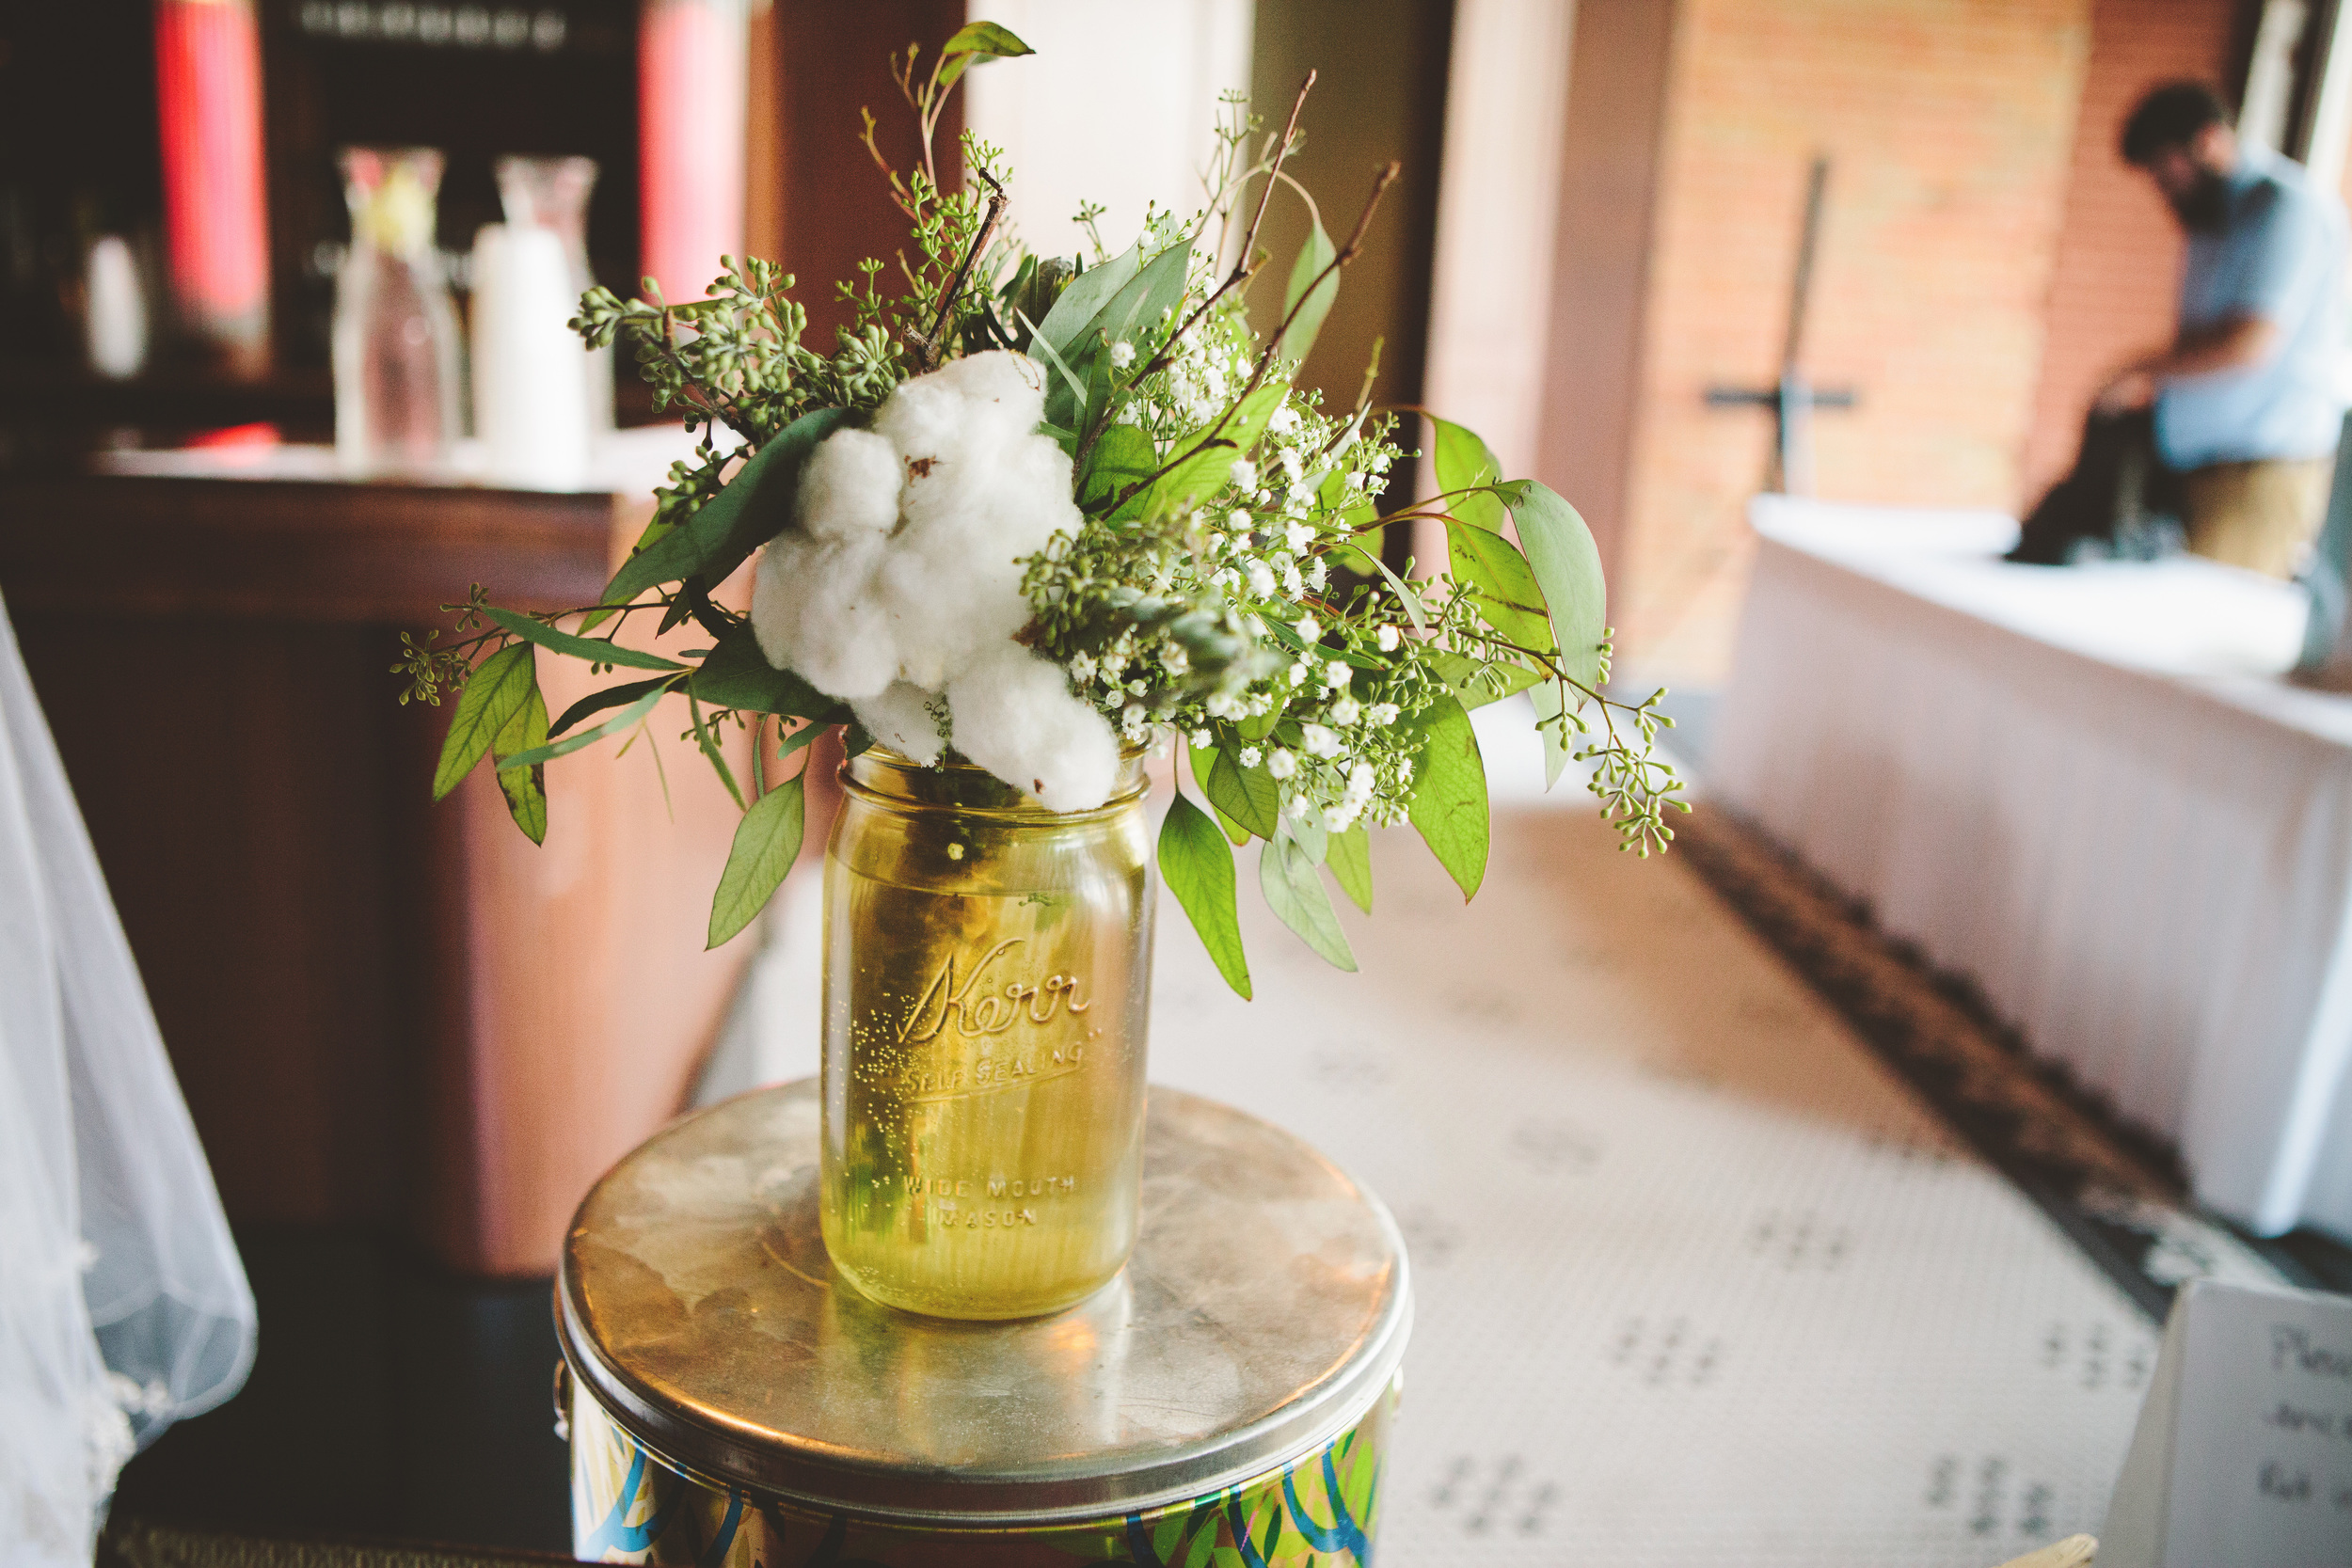 the-bees-knees-floral-design-studio-brainerd-mn-minnesota-florist-wedding-weddings-bride-greenery-cotton-branch-toss-bouquet